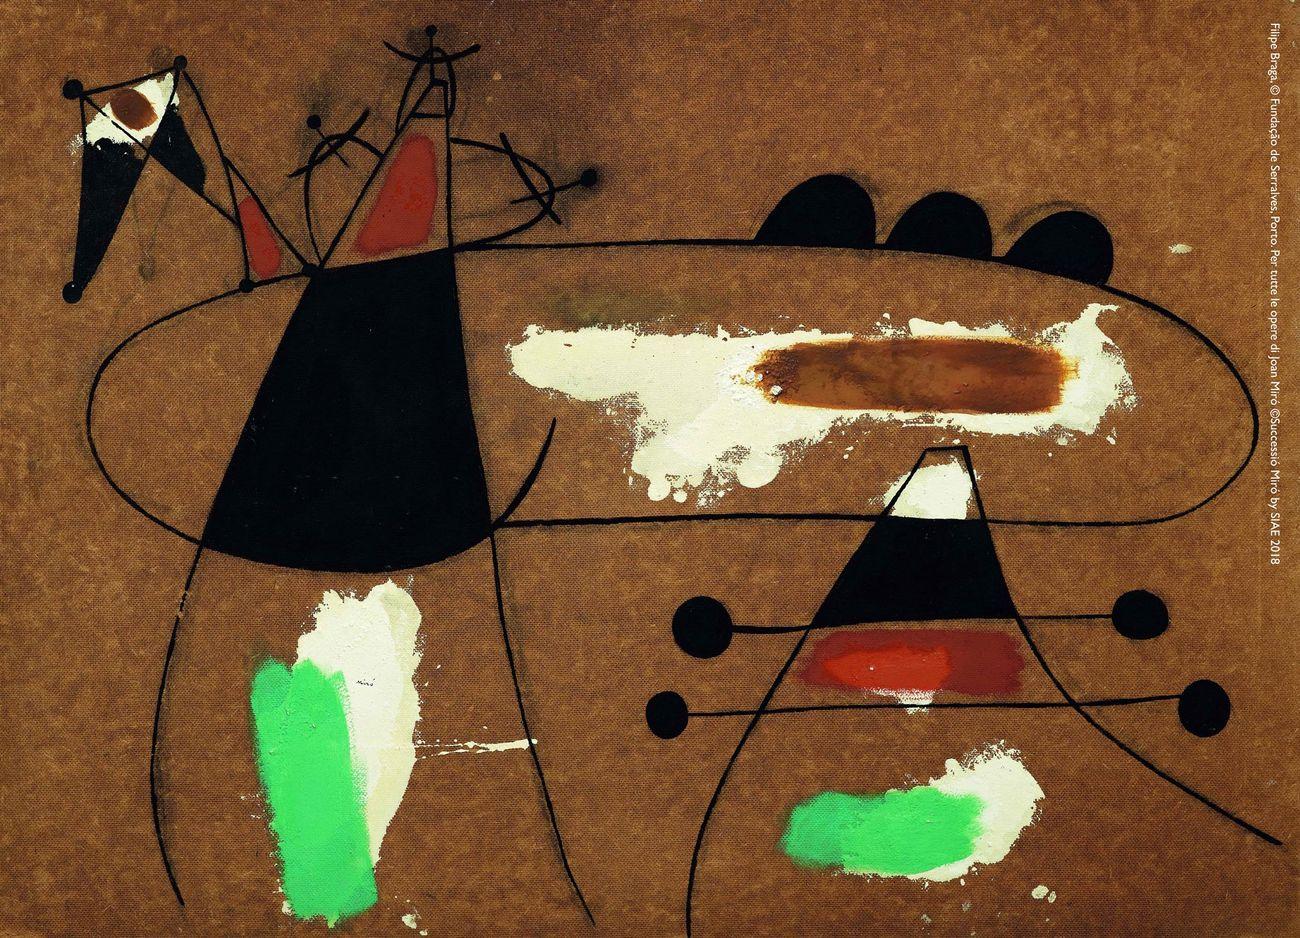 Joan Miró, Peinture, 1936. Filipe Braga, © Fundação de Serralves, Porto. ©Successió Miró by SIAE 2018